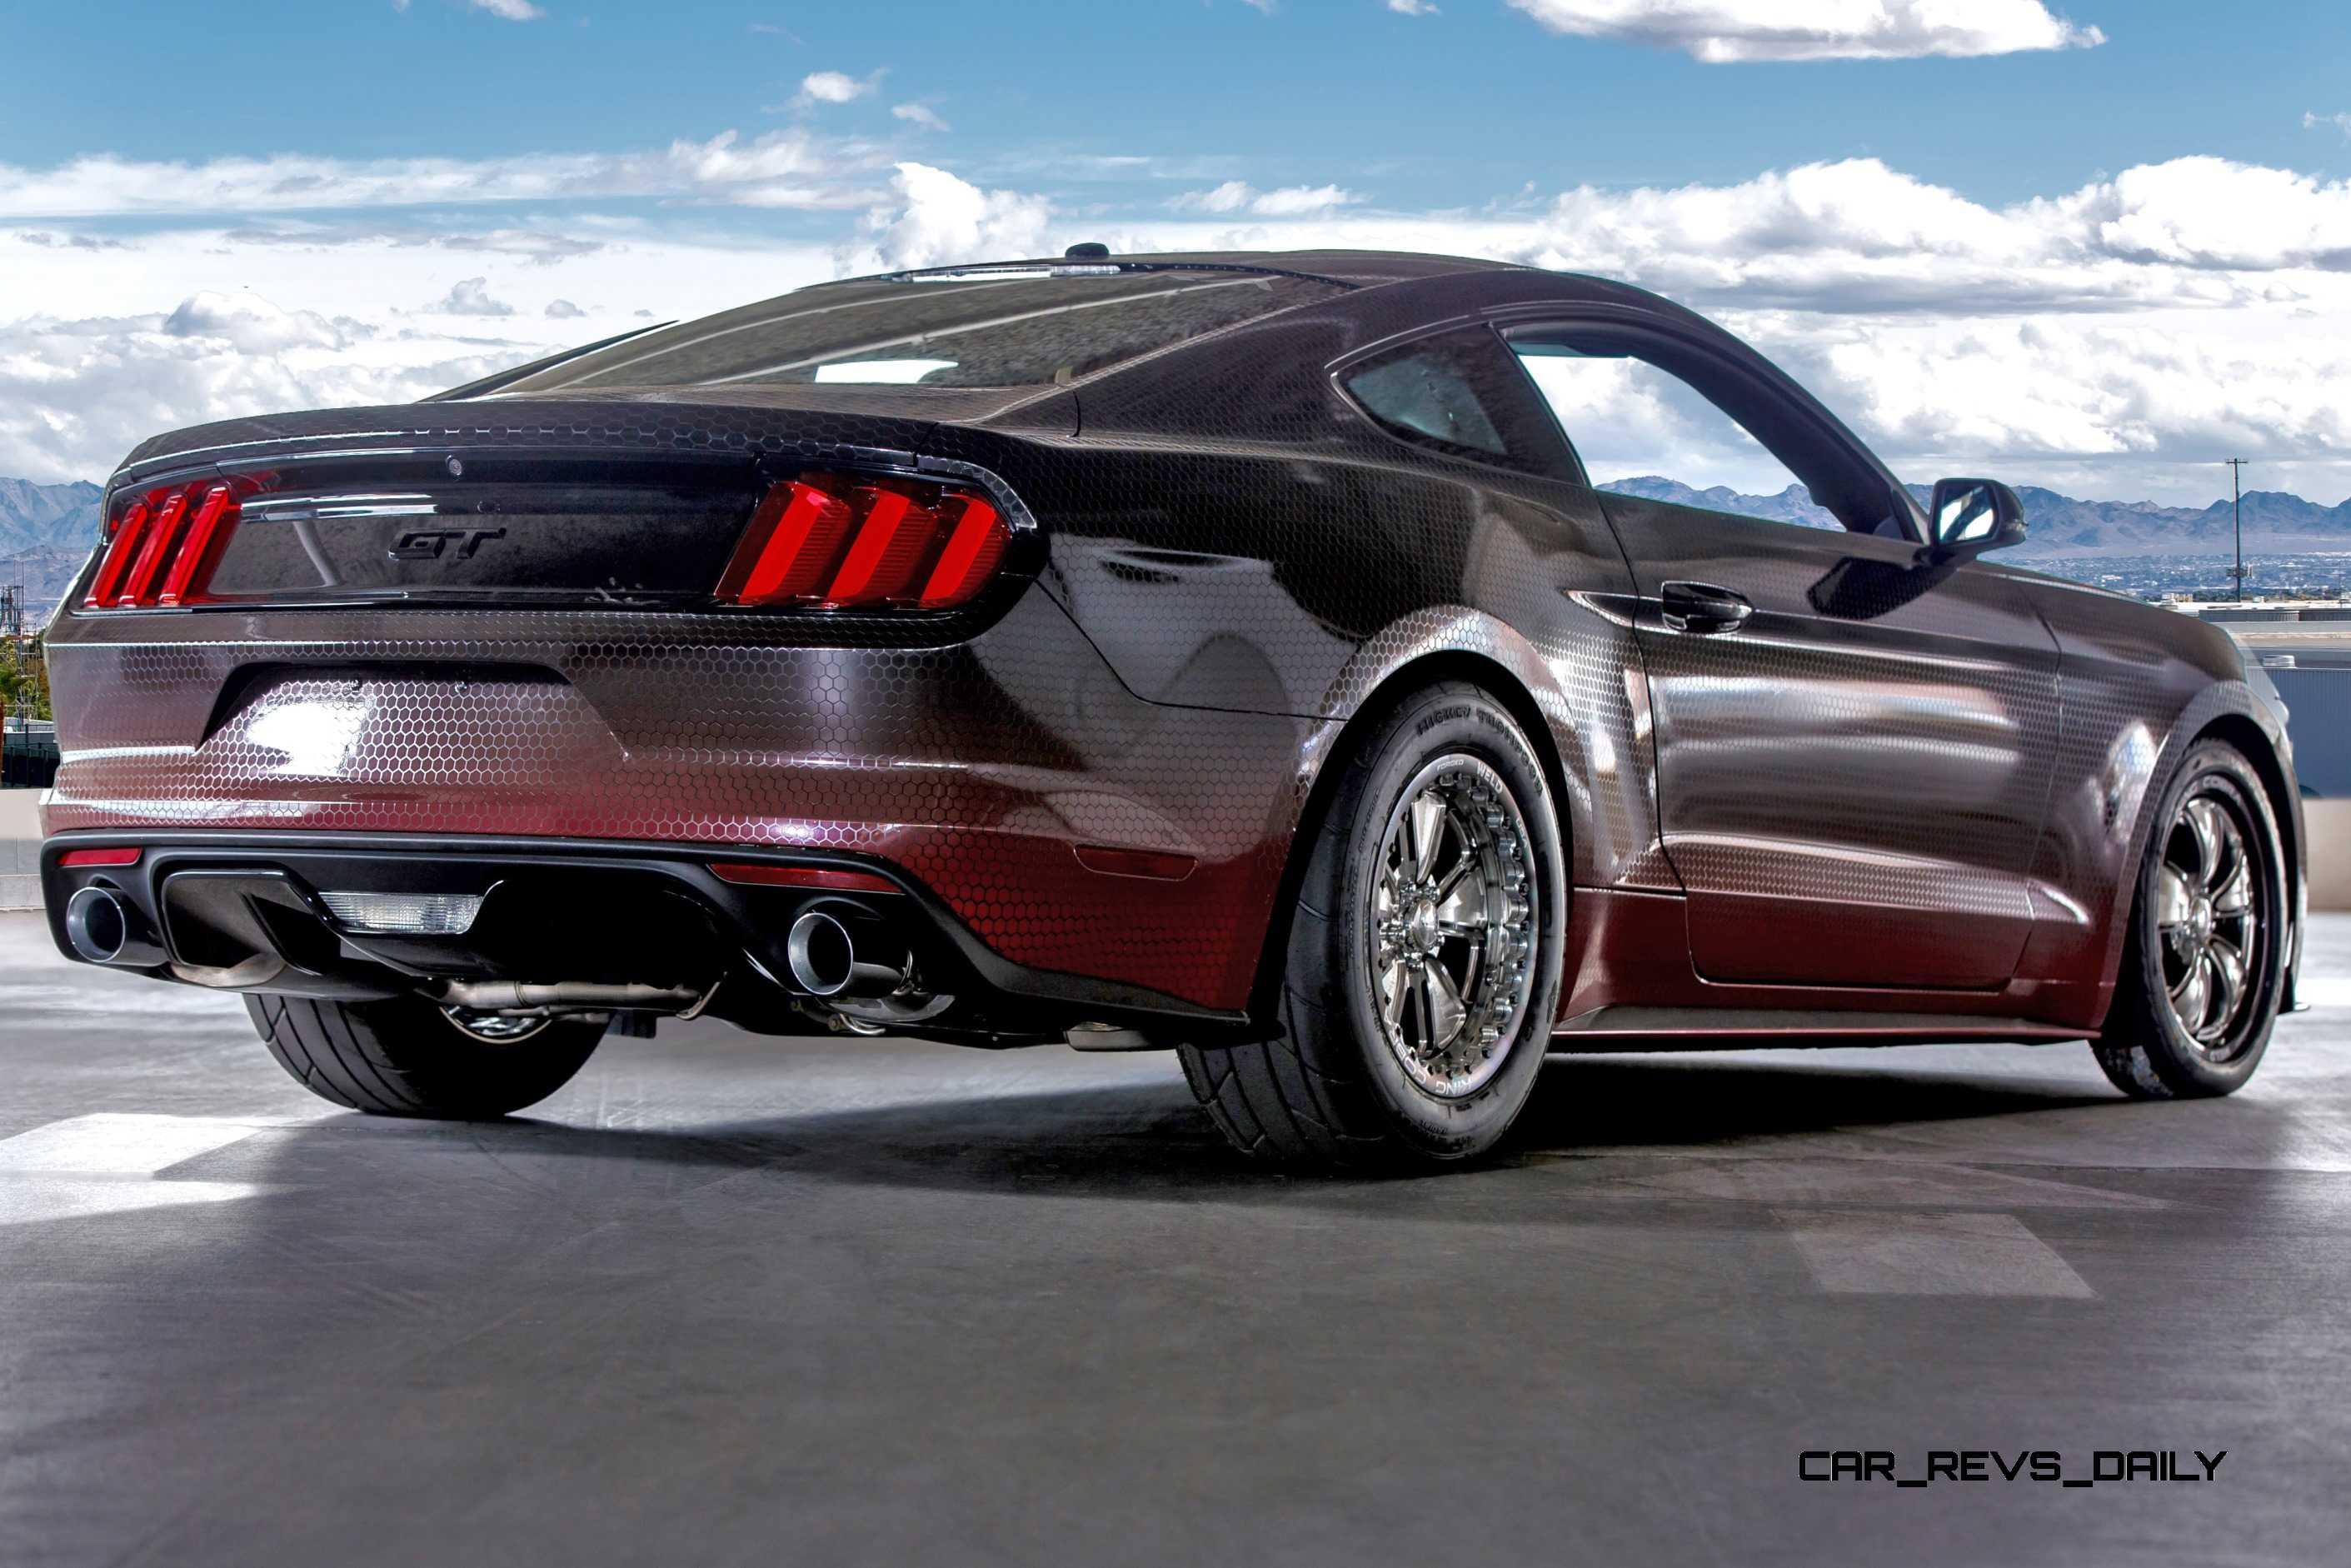 Cobra Kit Car >> 2015 Ford Mustang KING COBRA Is 625HP Factory-Parts Cobra Jet Upgrade List!